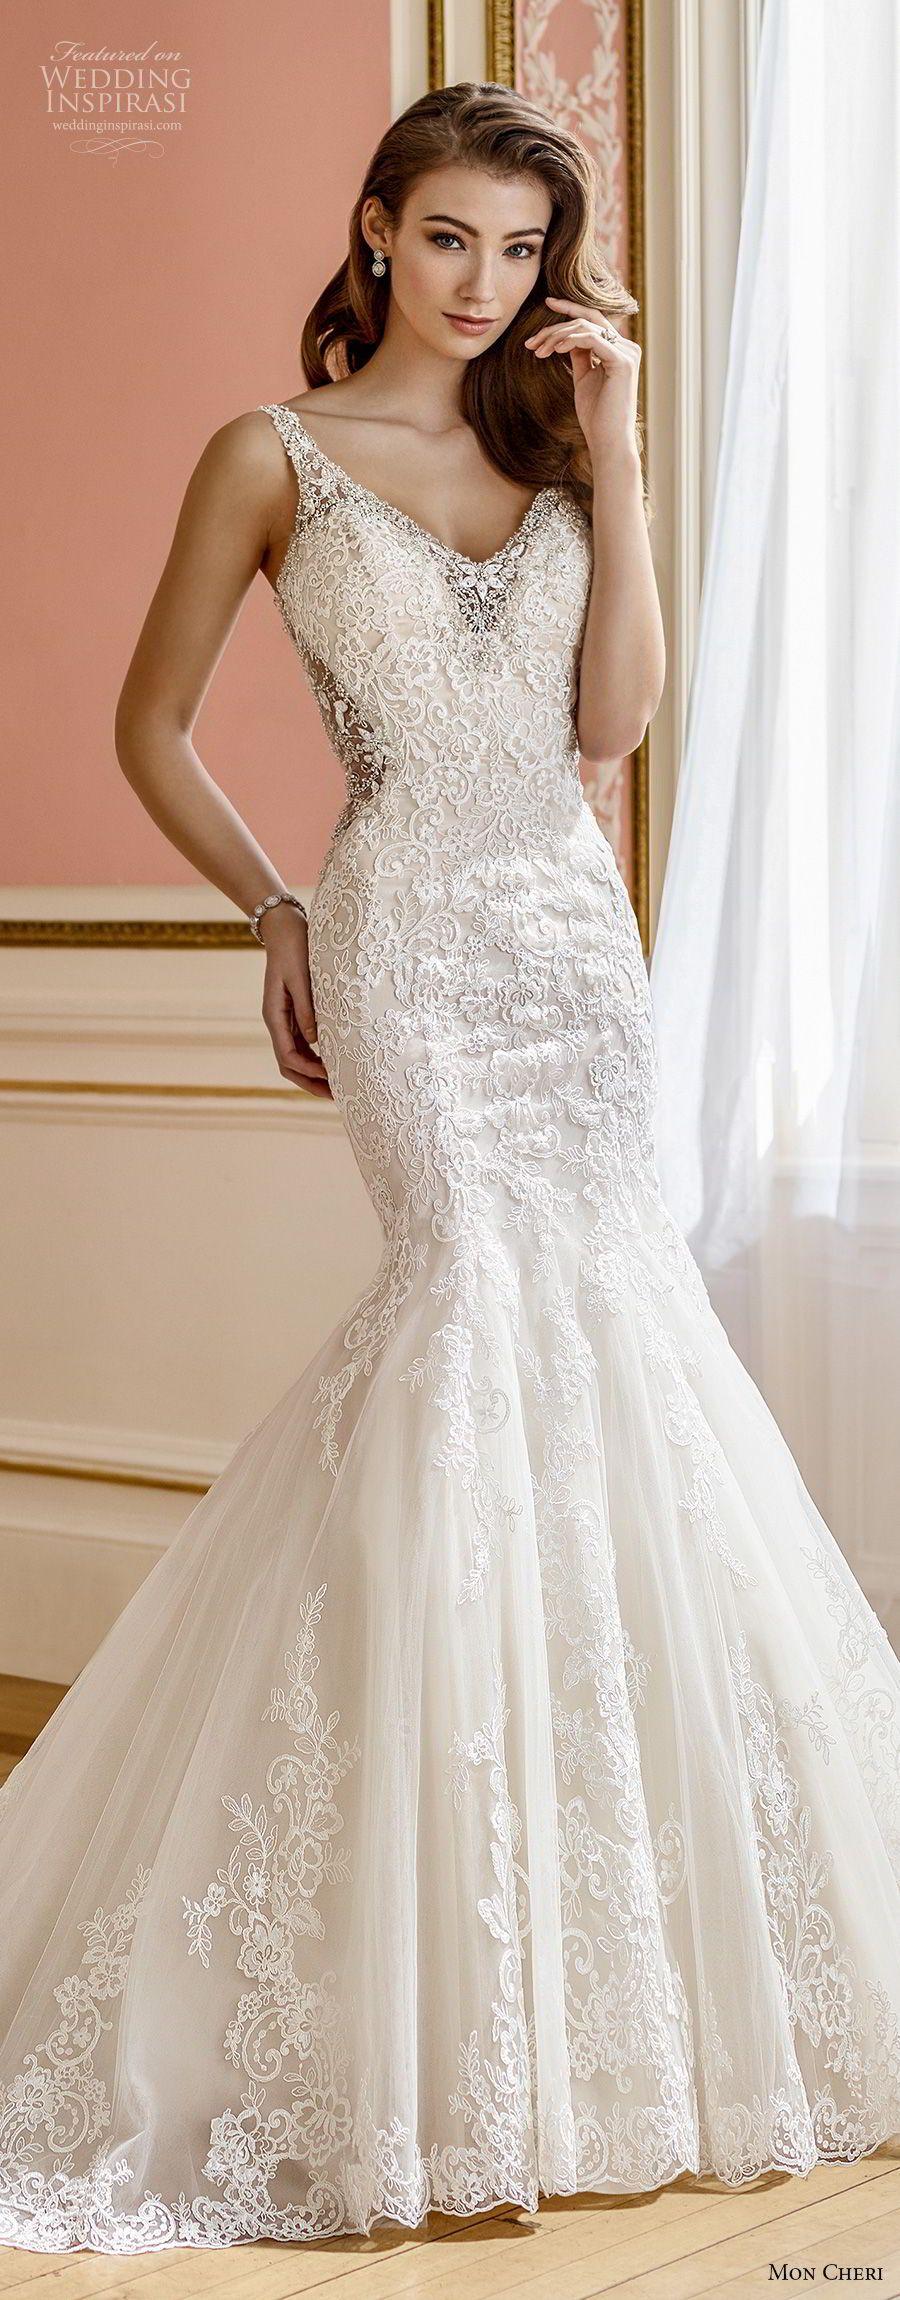 Elegant mermaid wedding dresses  Mon Cheri Fall  Wedding Dresses  Mermaid wedding dresses